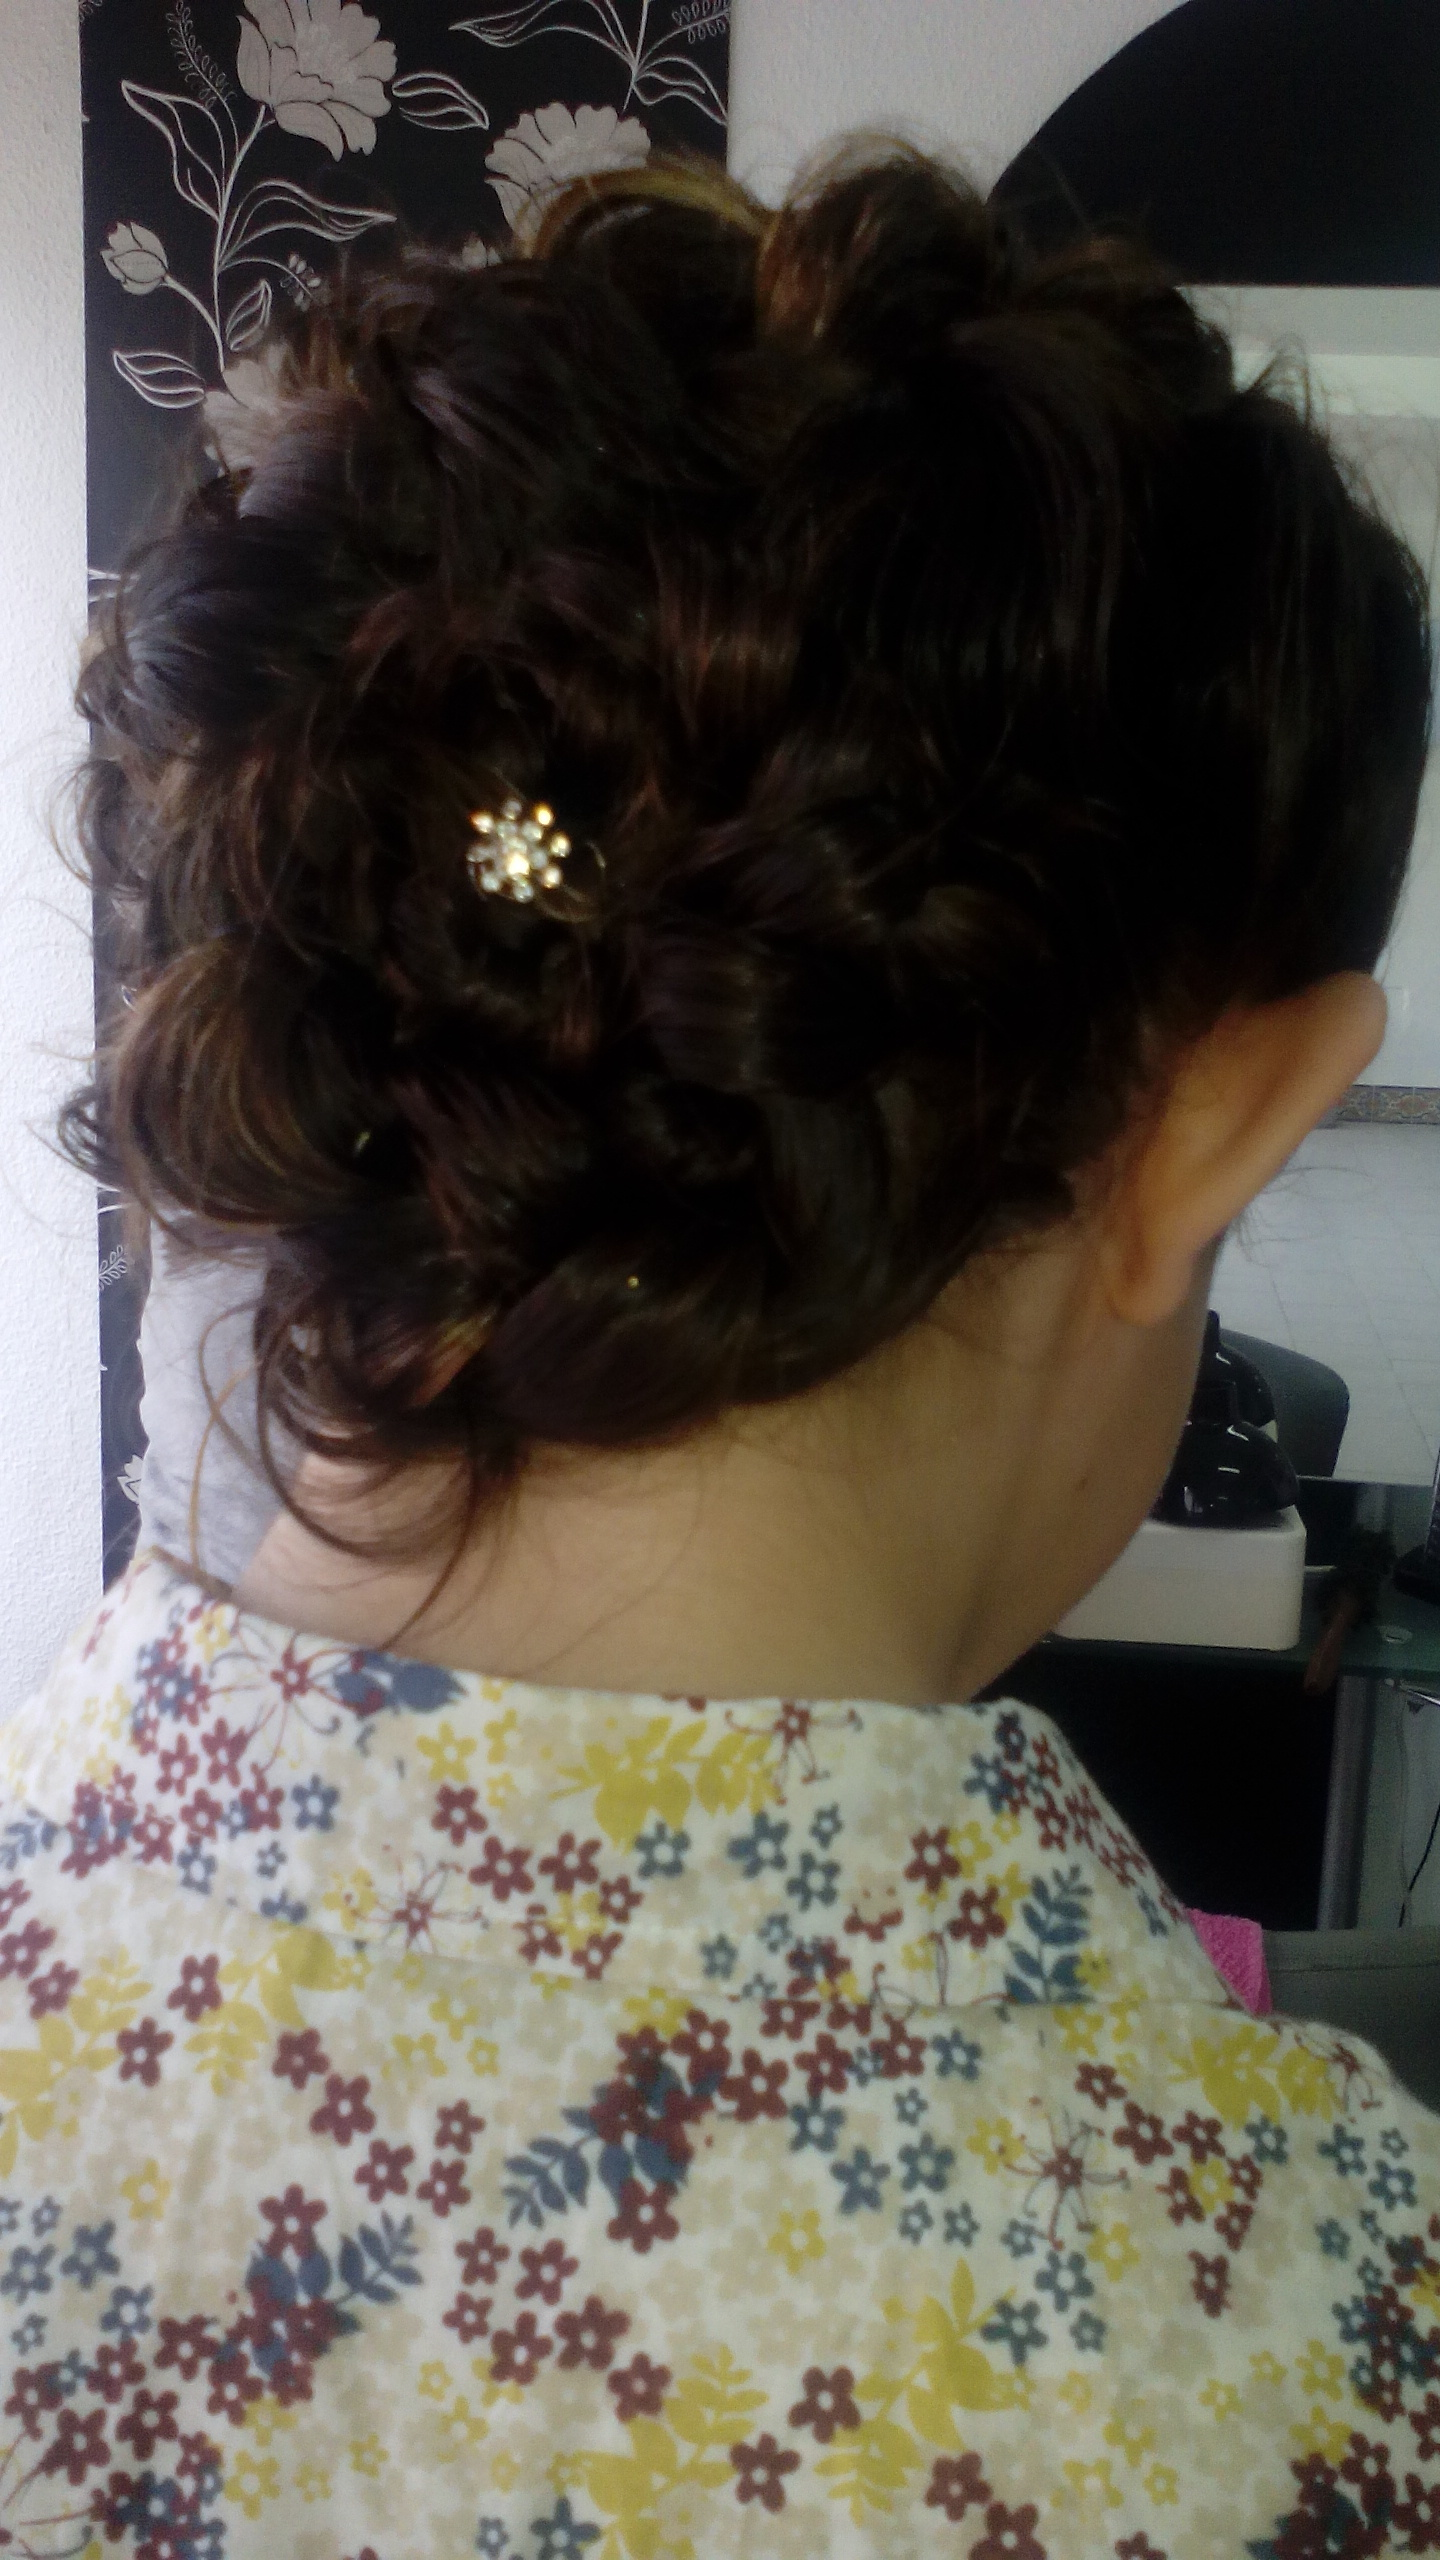 cabeleireiro(a) esteticista massoterapeuta cabeleireiro(a) esteticista massoterapeuta